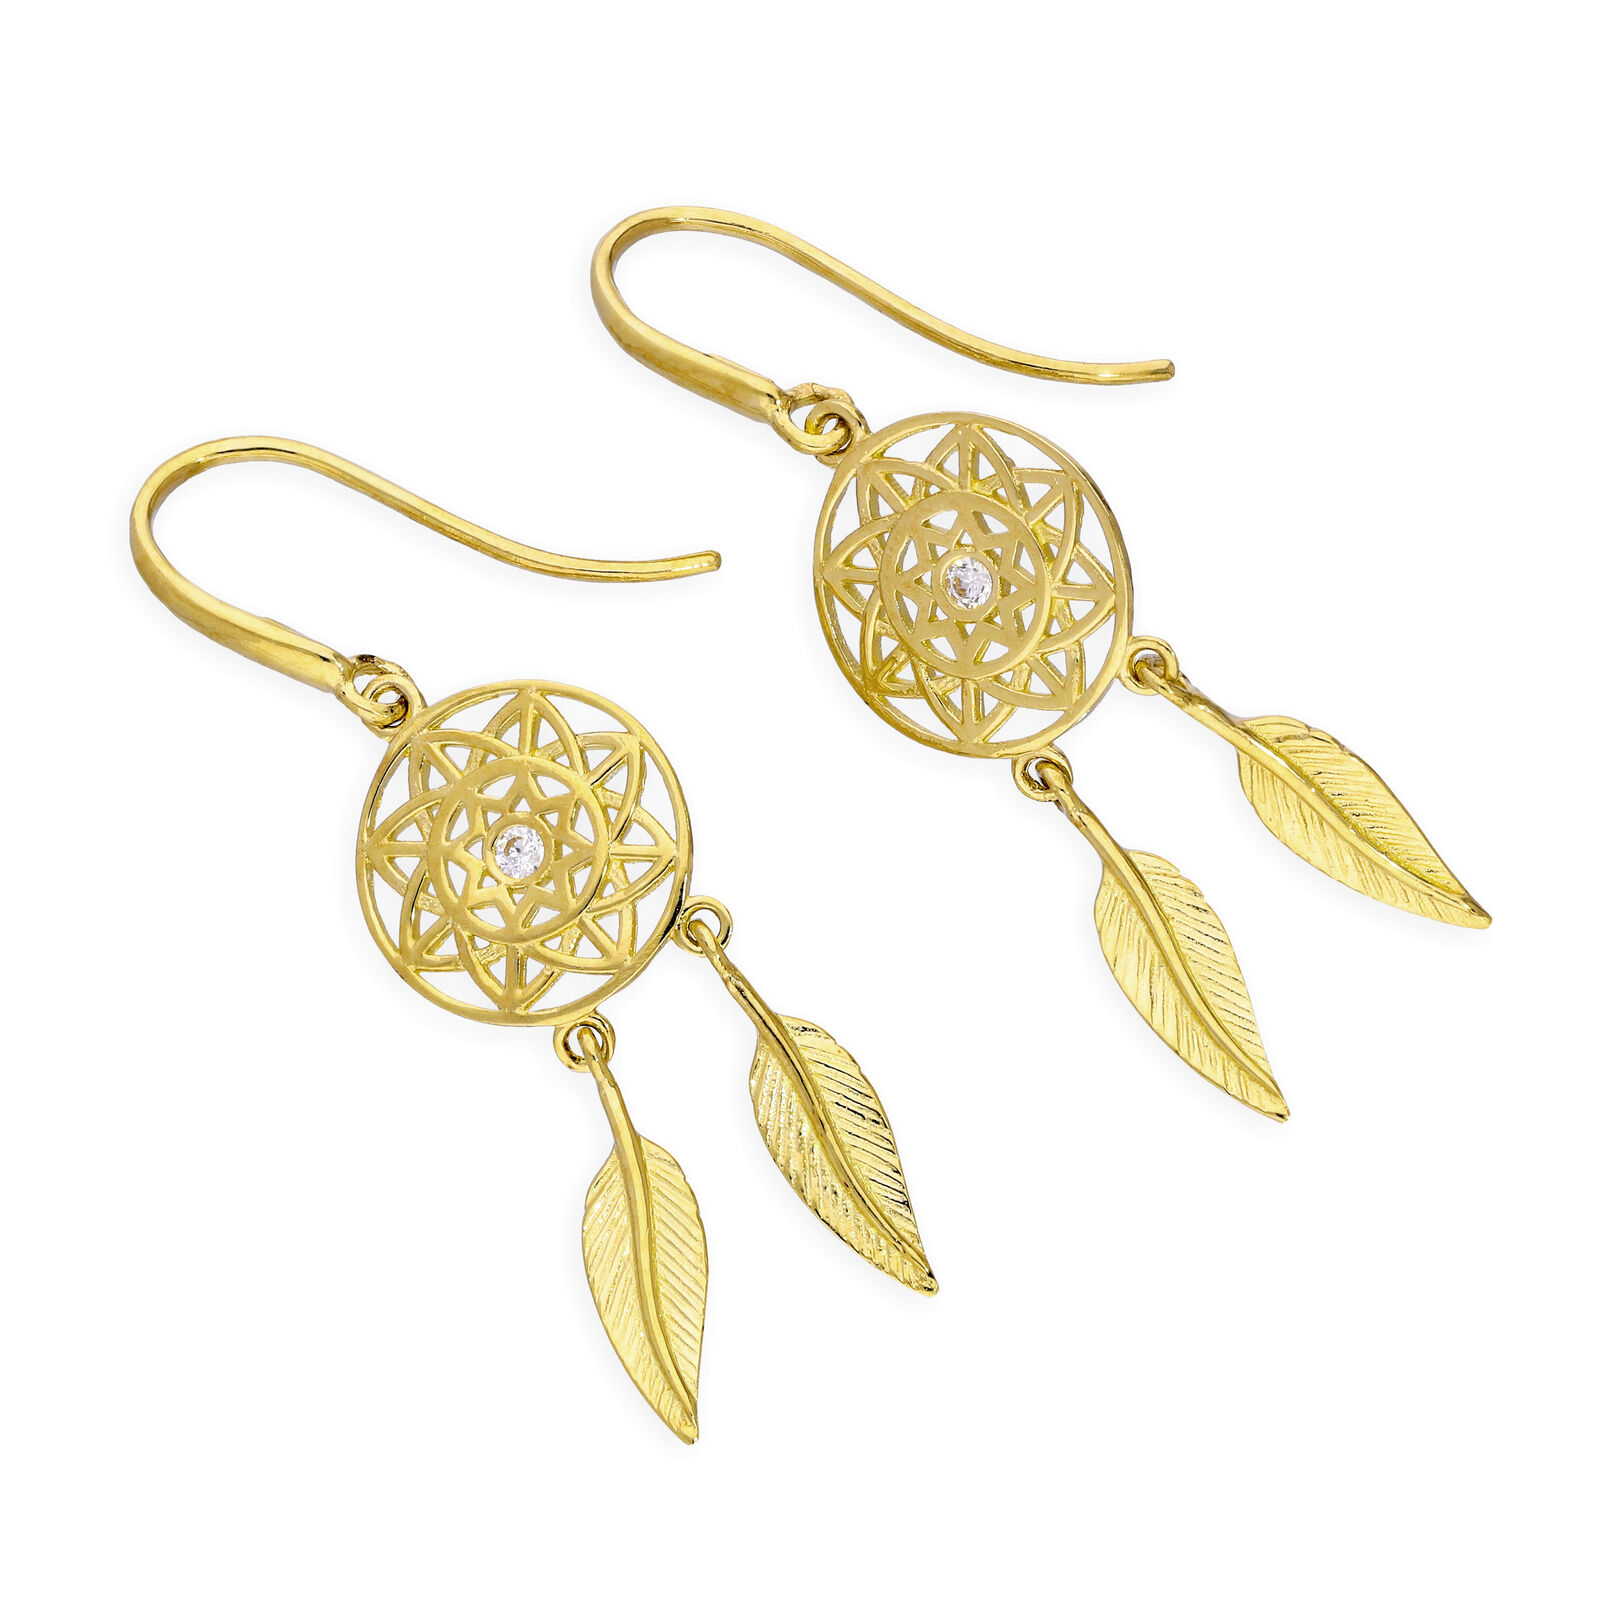 9ct gold & Clear CZ Crystal Dreamcatcher Dangle Earrings Dream Catcher